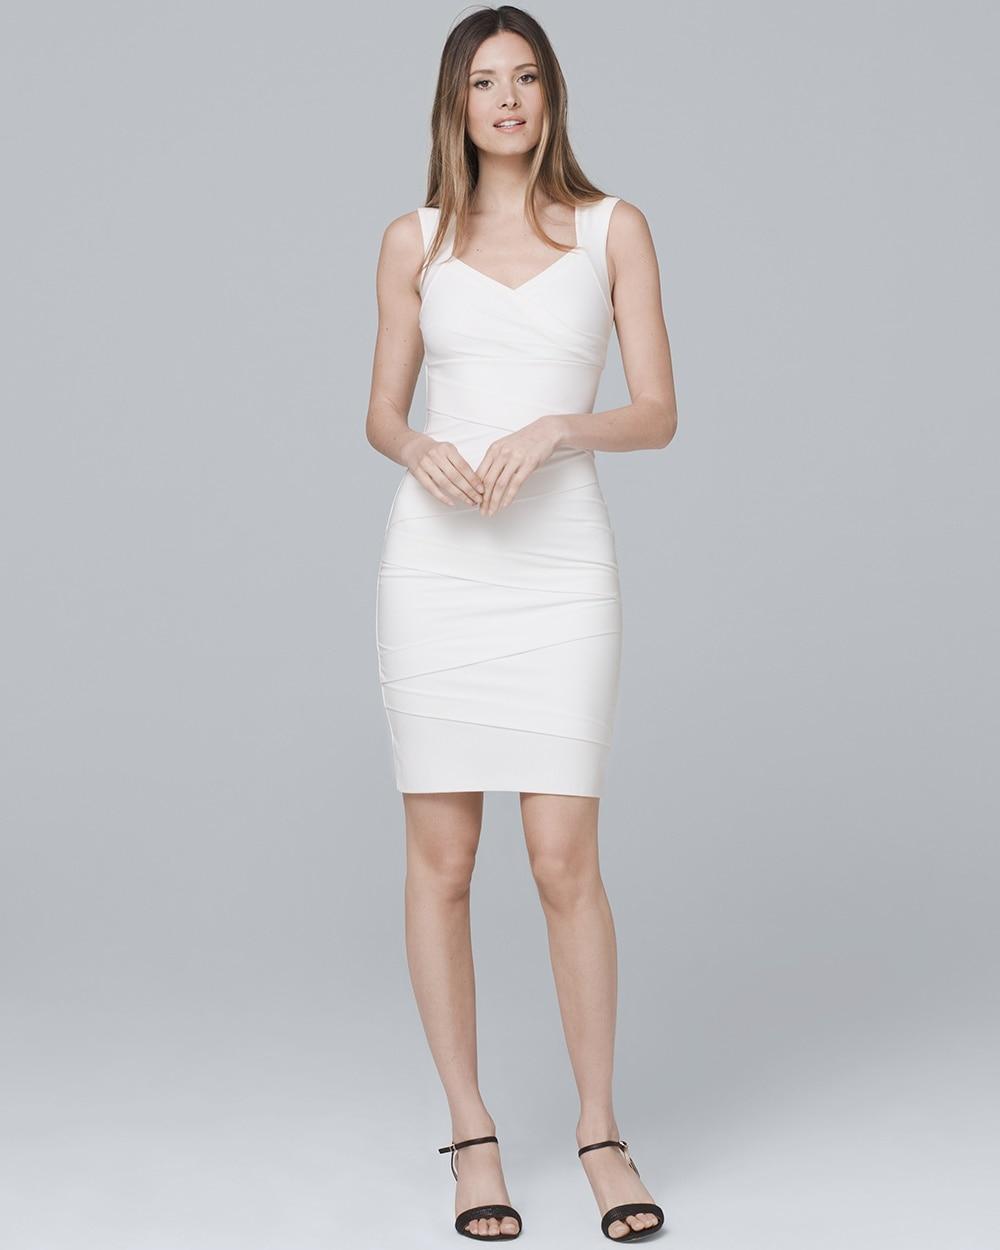 Instantly Slimming White Tank Dress